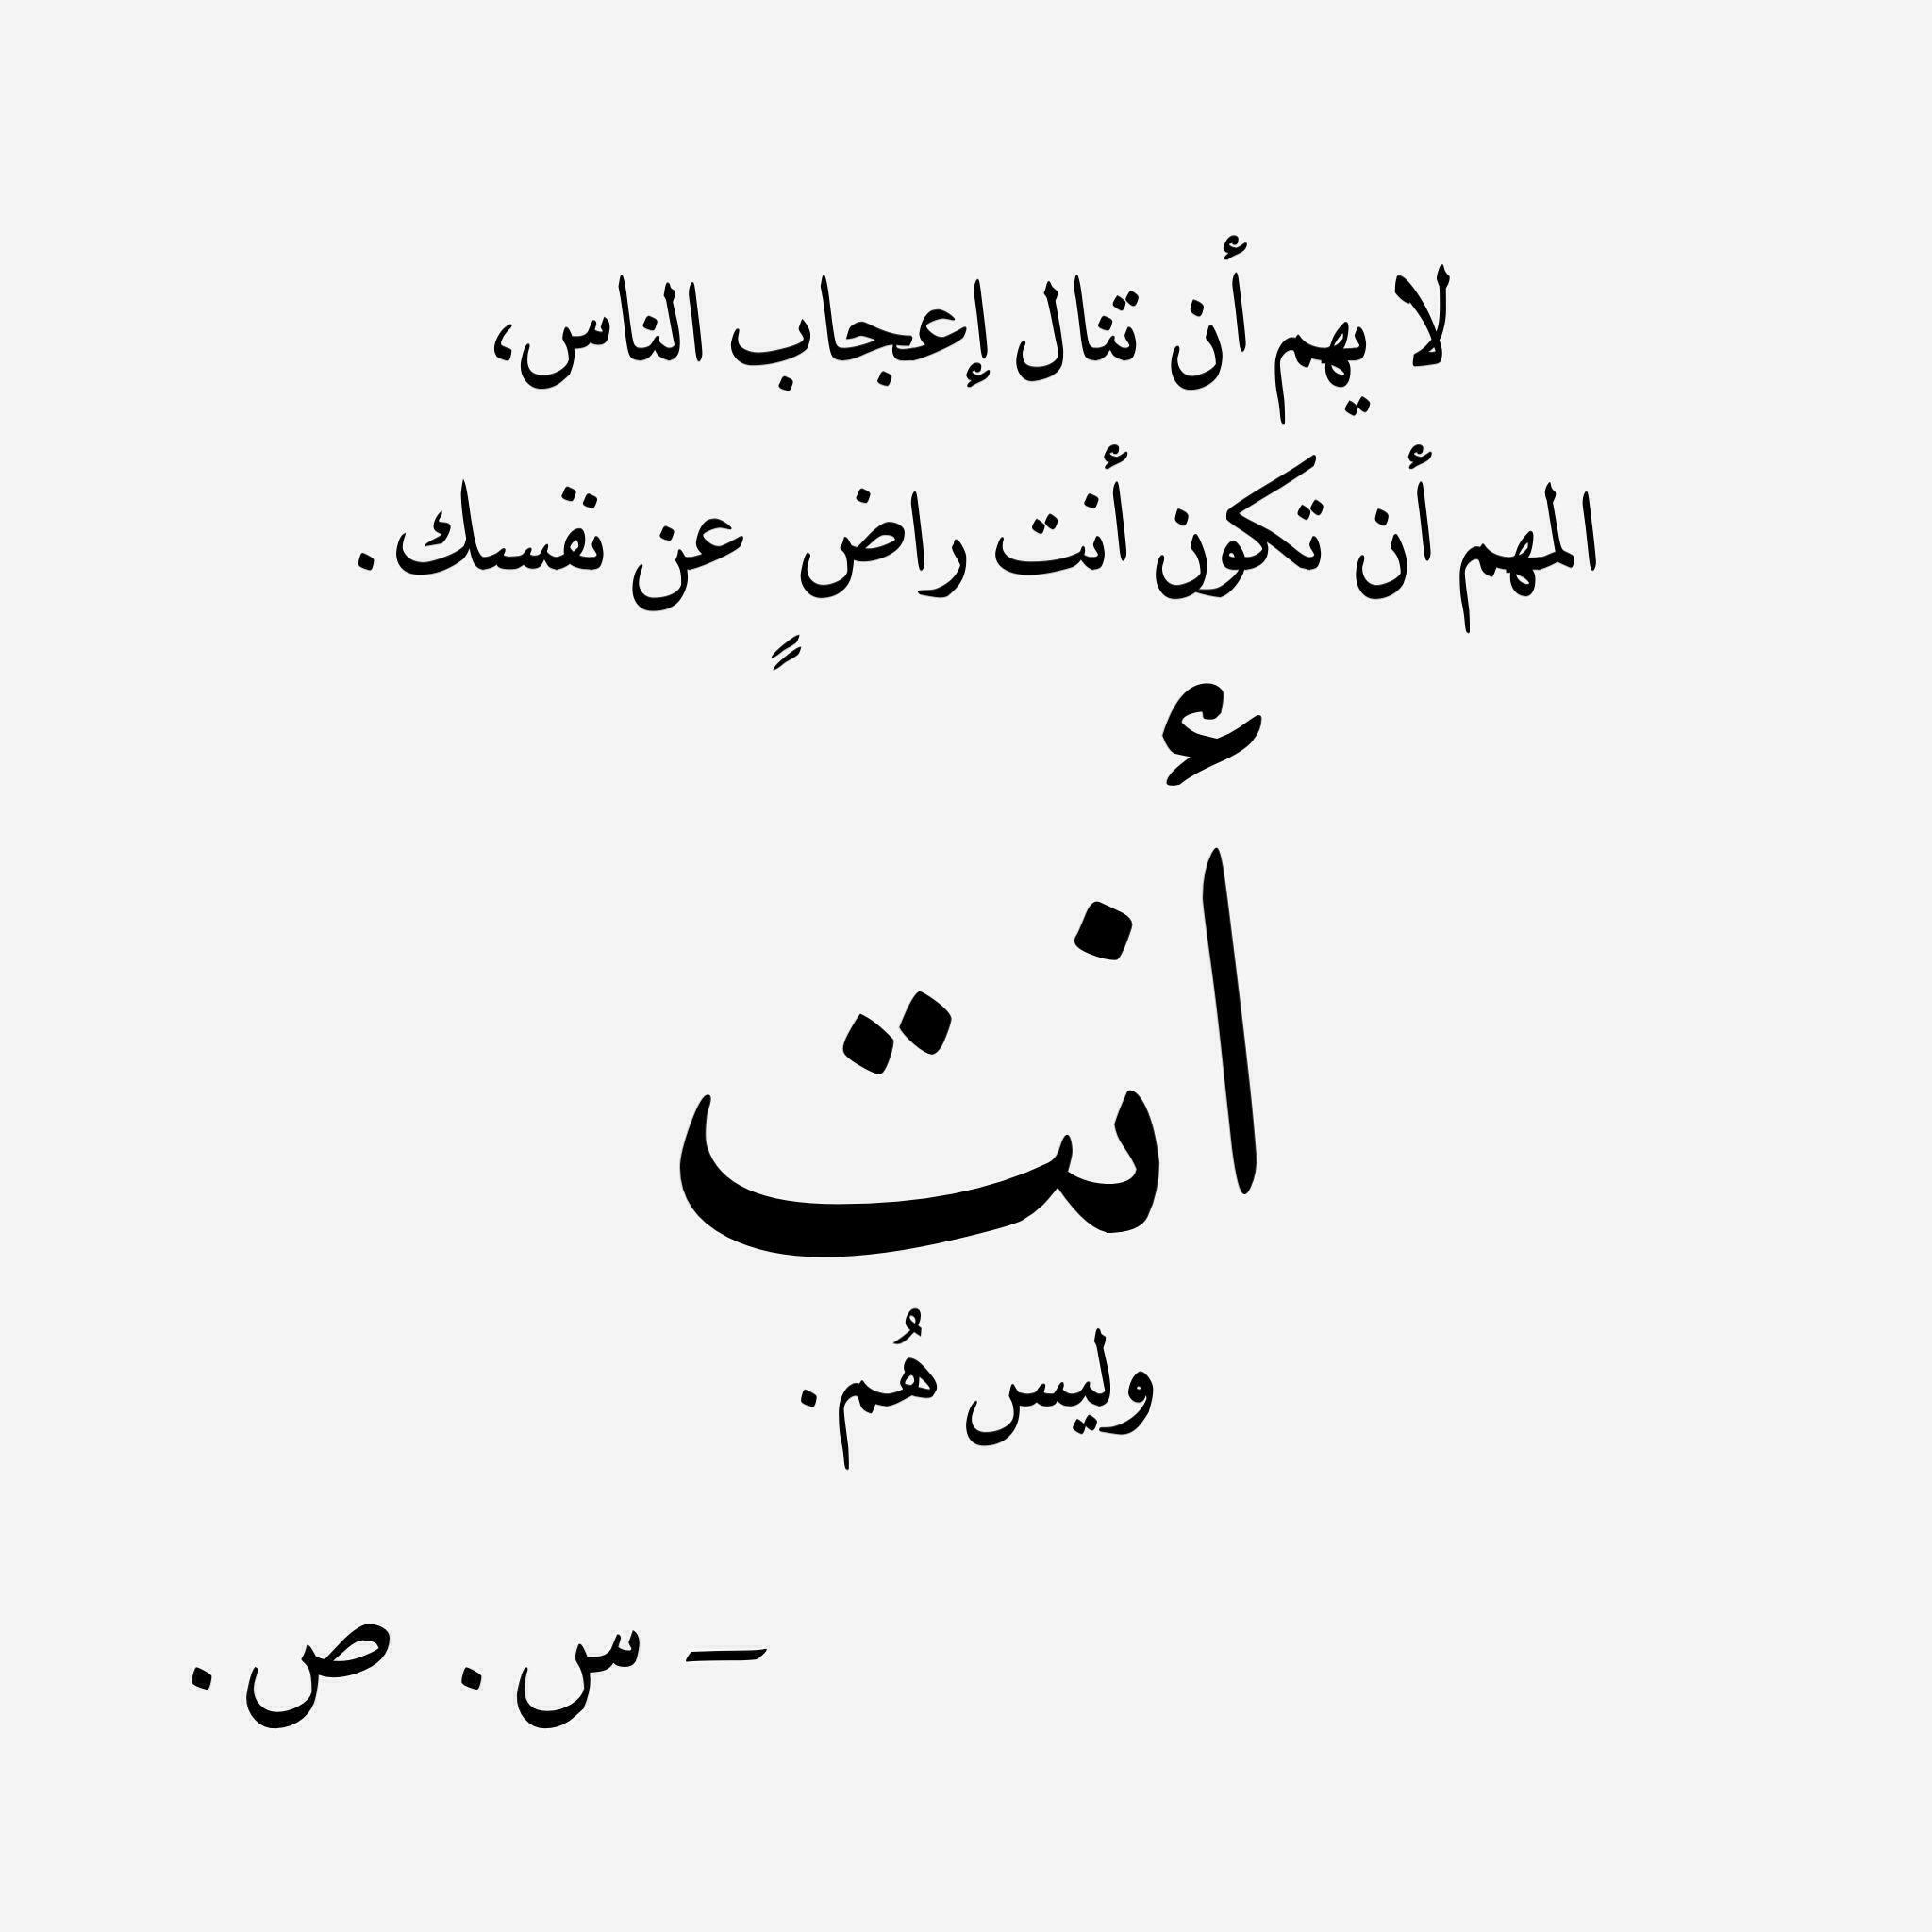 المهم ان تكون راض عن نفسك Words Quotes Cool Words Words